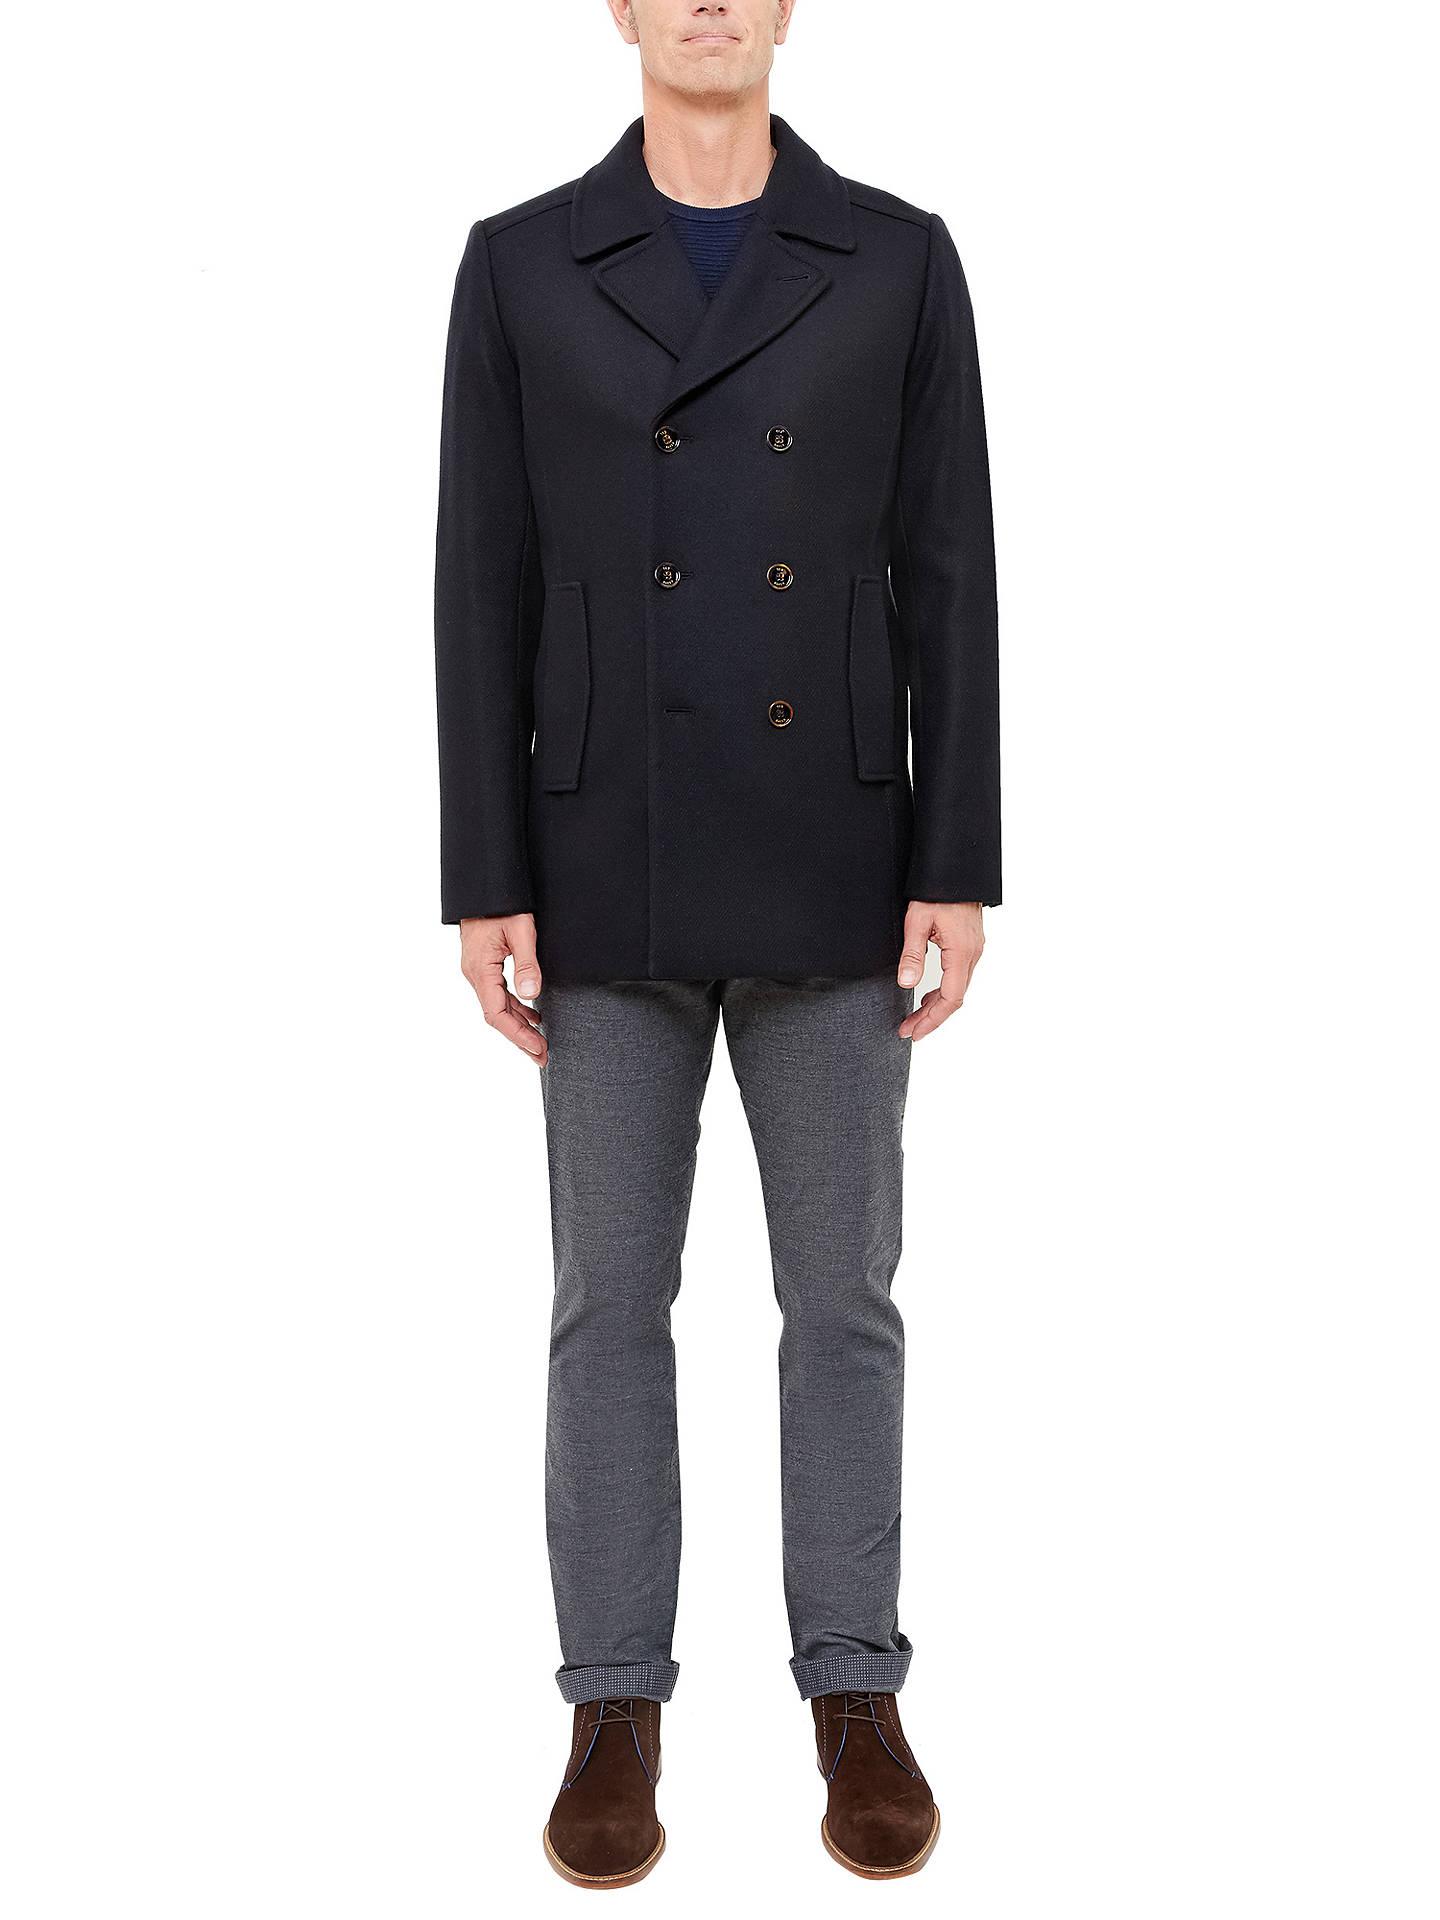 5b30b992cacff ... Buy Ted Baker T for Tall Bizatt Wool-Blend Peacoat